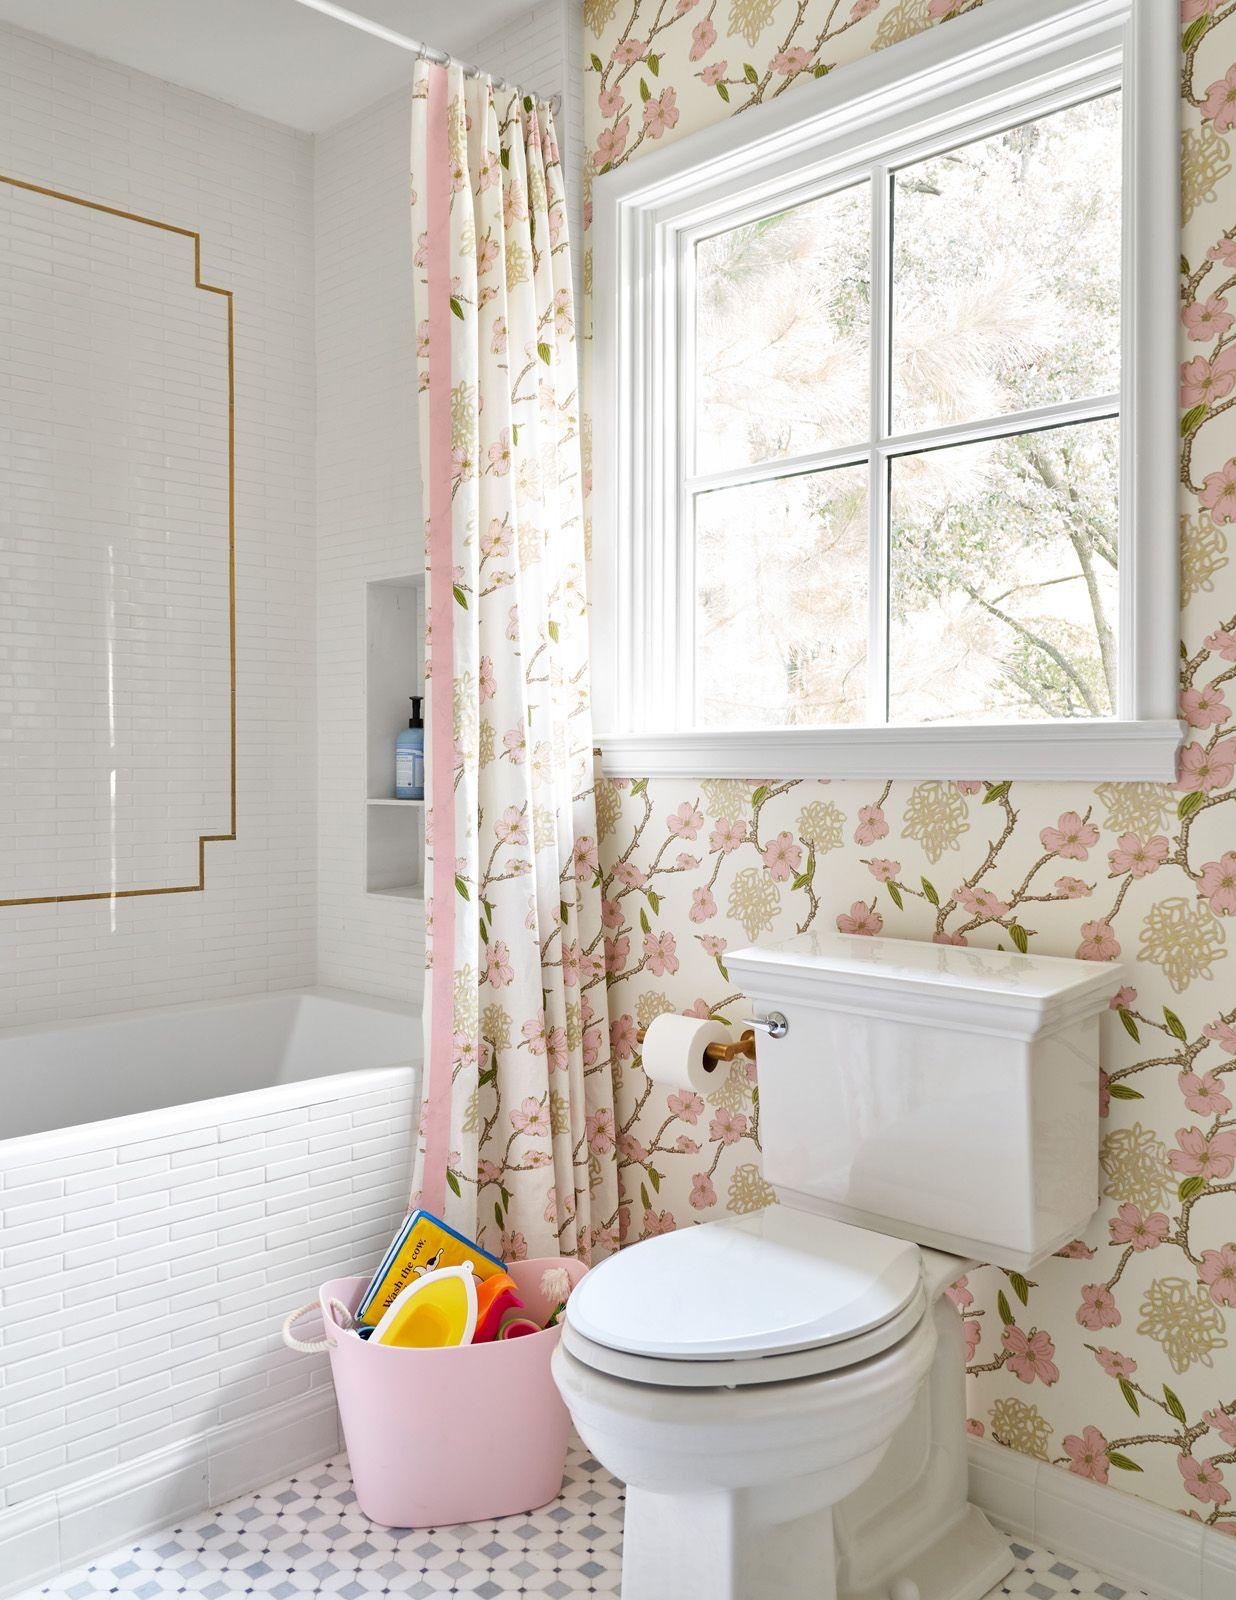 Preston Hollow Amy Berry Design Bathroom Wallpaper Girls